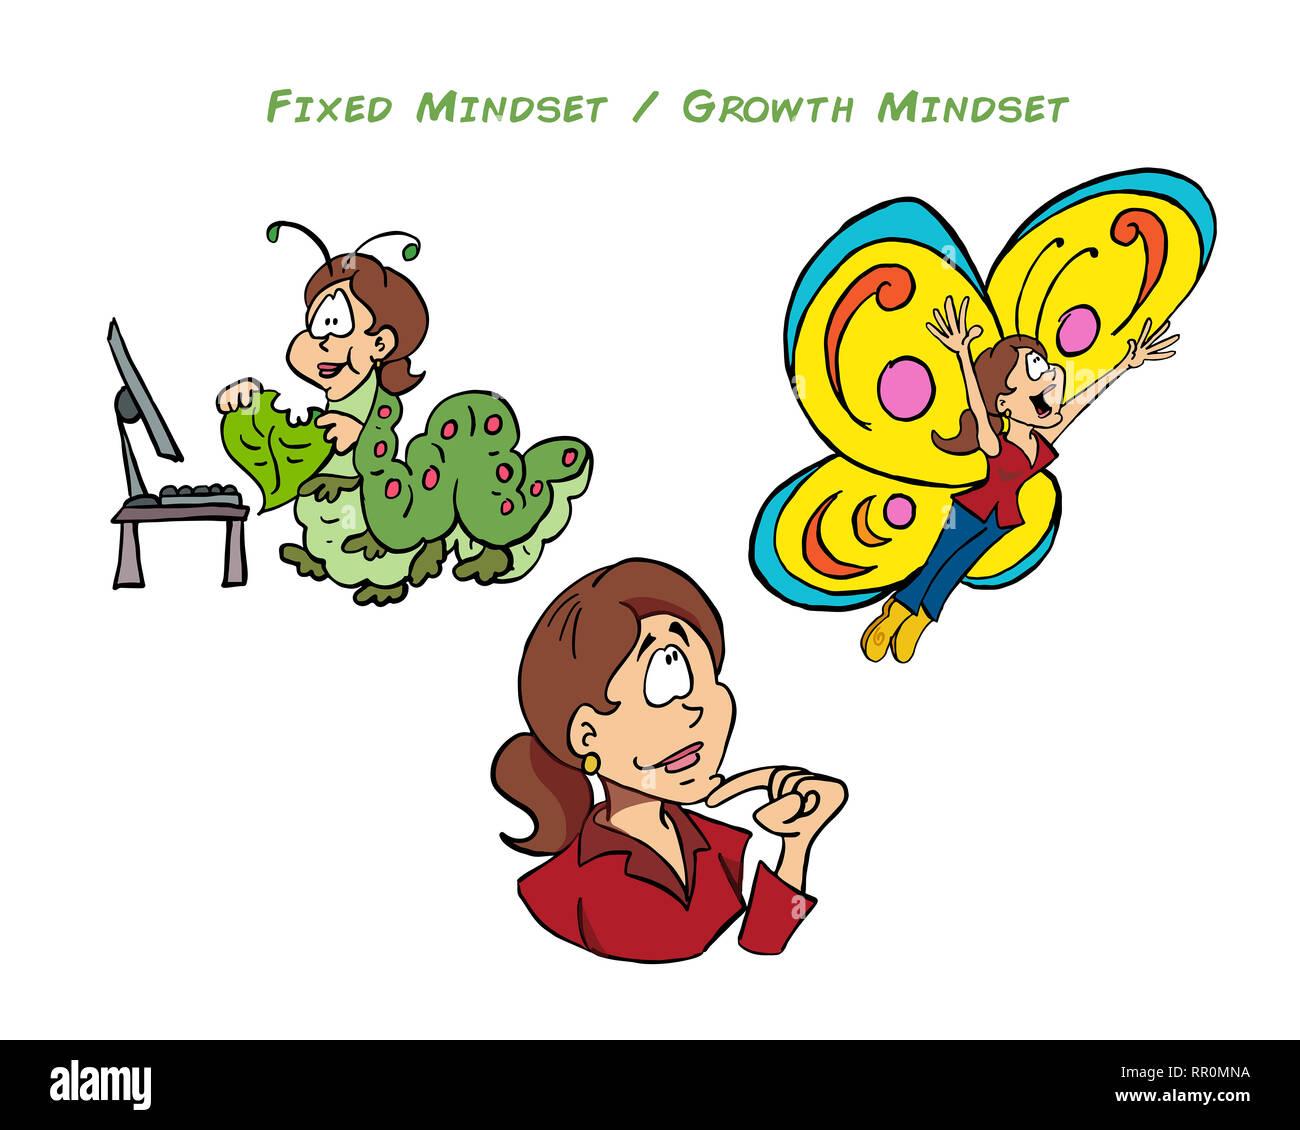 Growth mindset and fixed mindset - Sophie - Stock Image